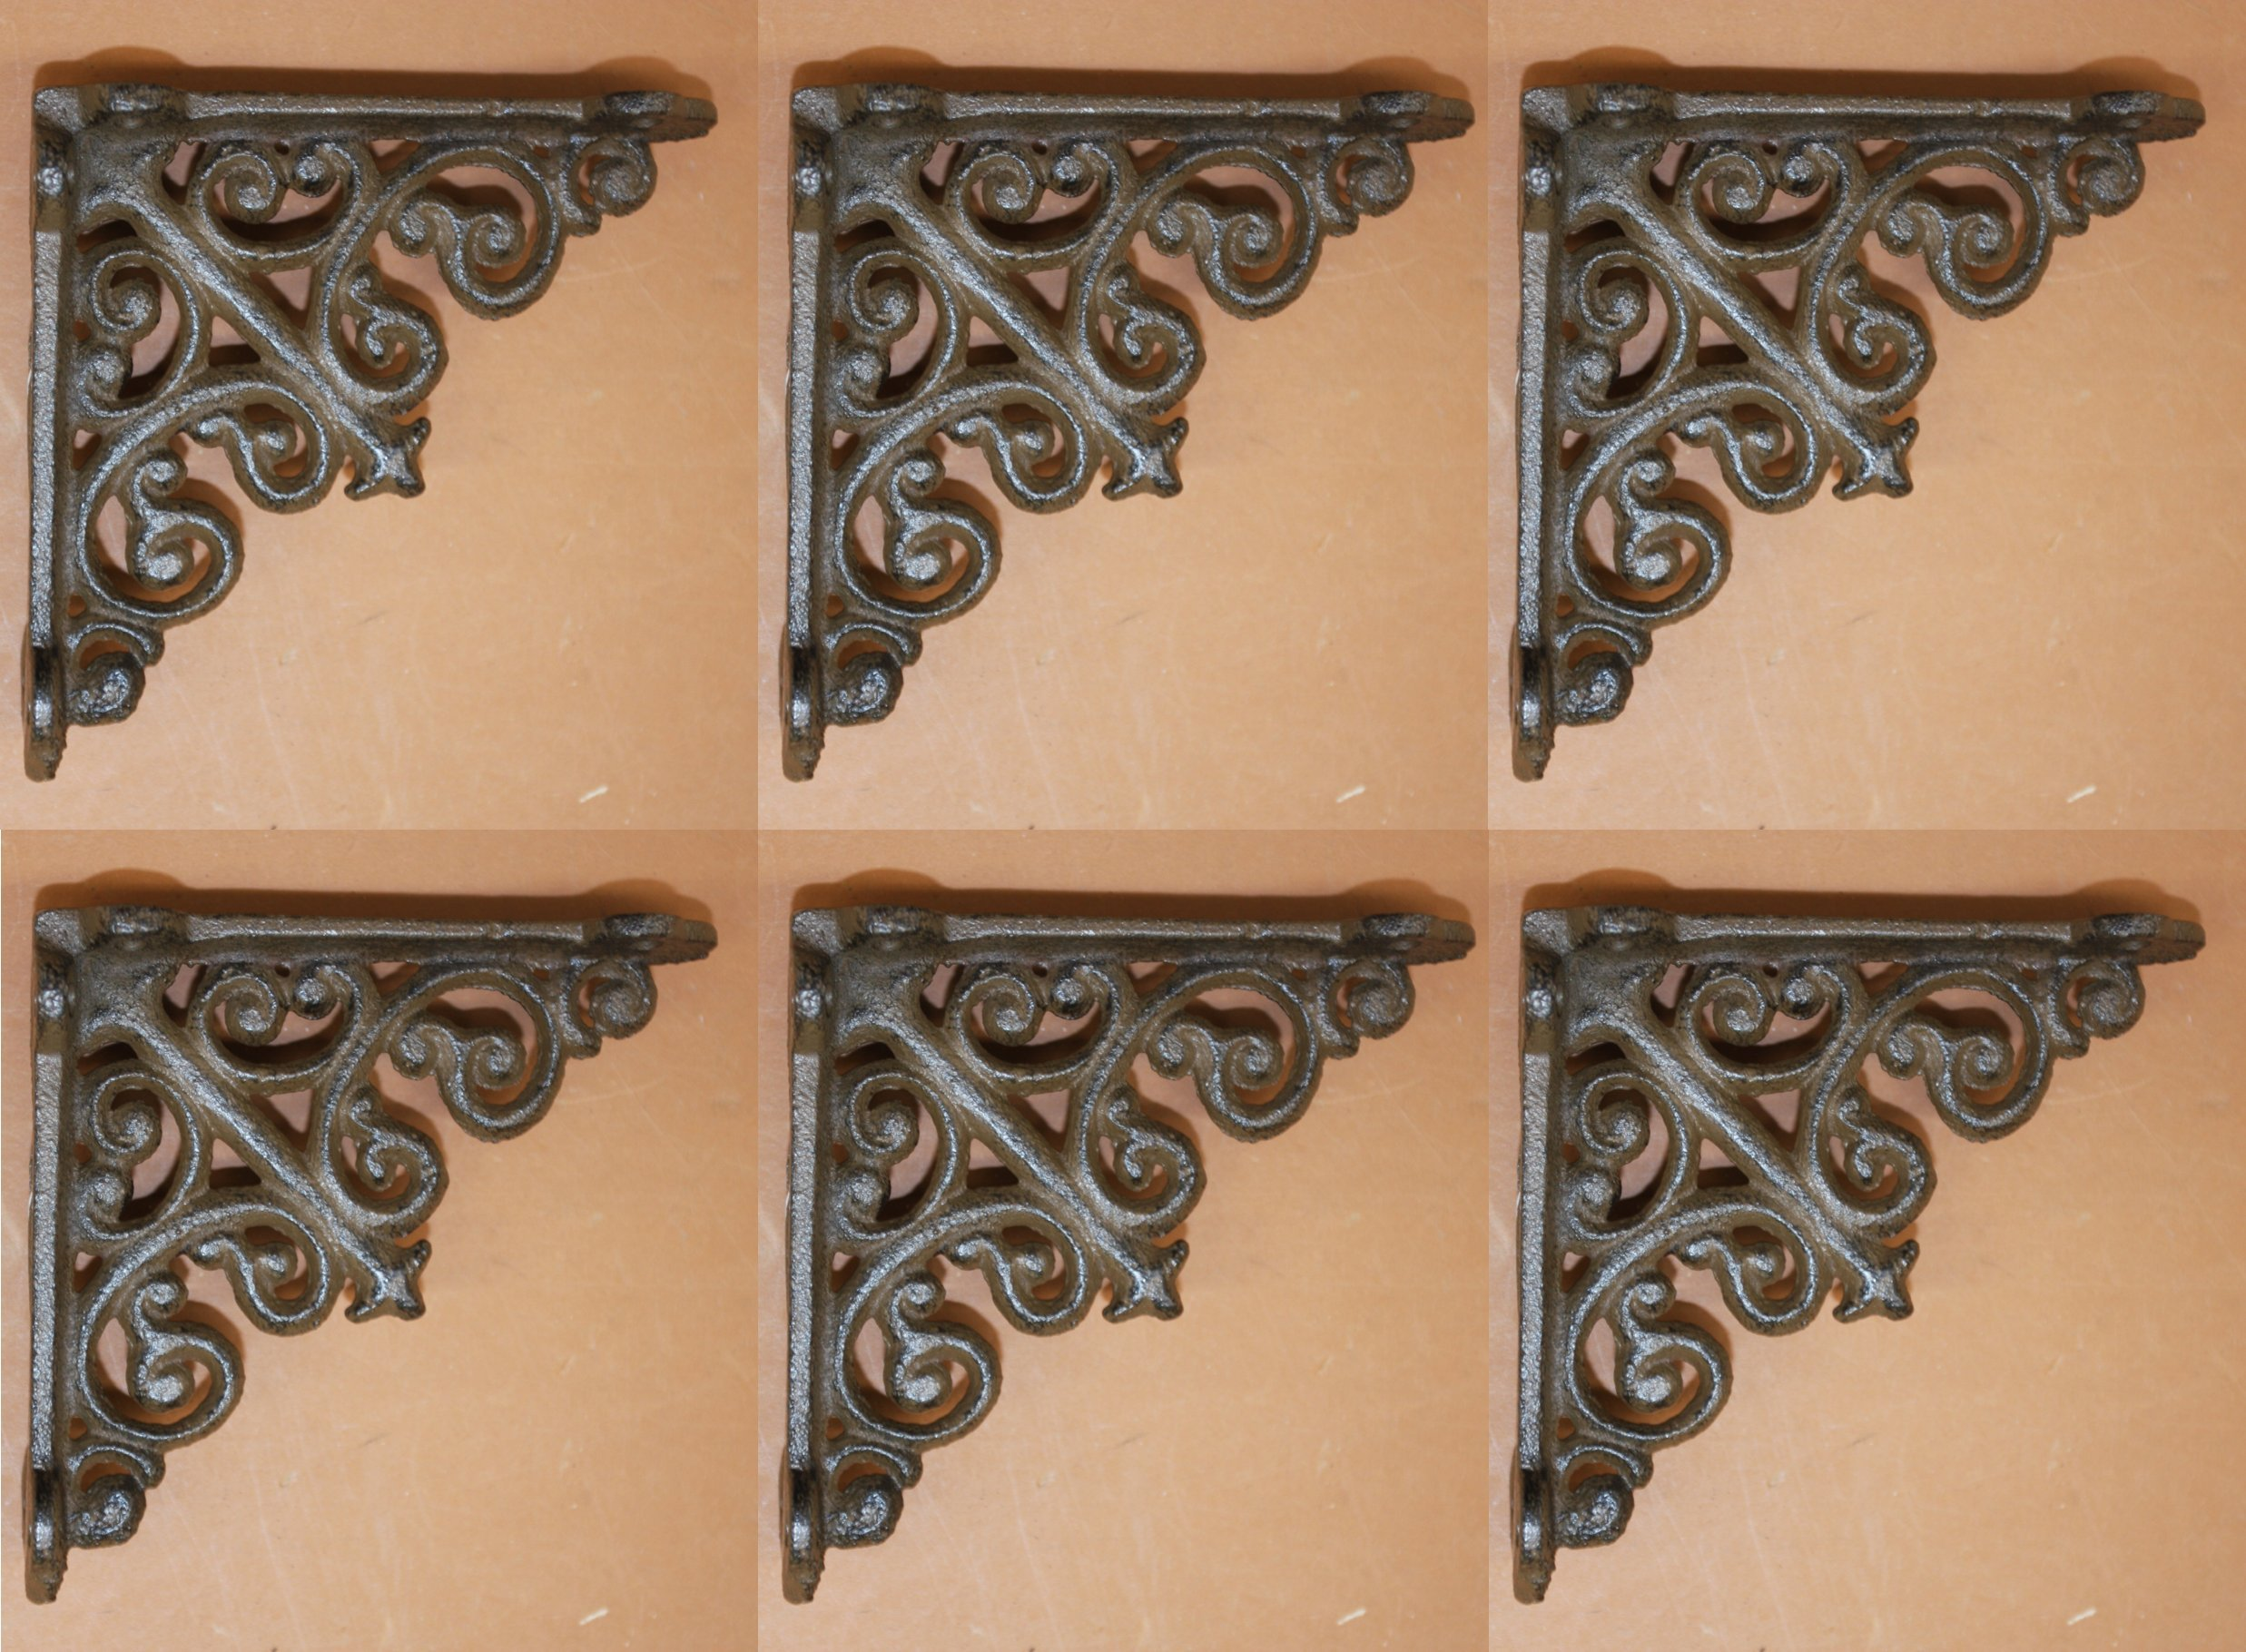 Small Victorian Shelf Brackets Solid Cast Iron, 3 7/8, Set of 6, B-27